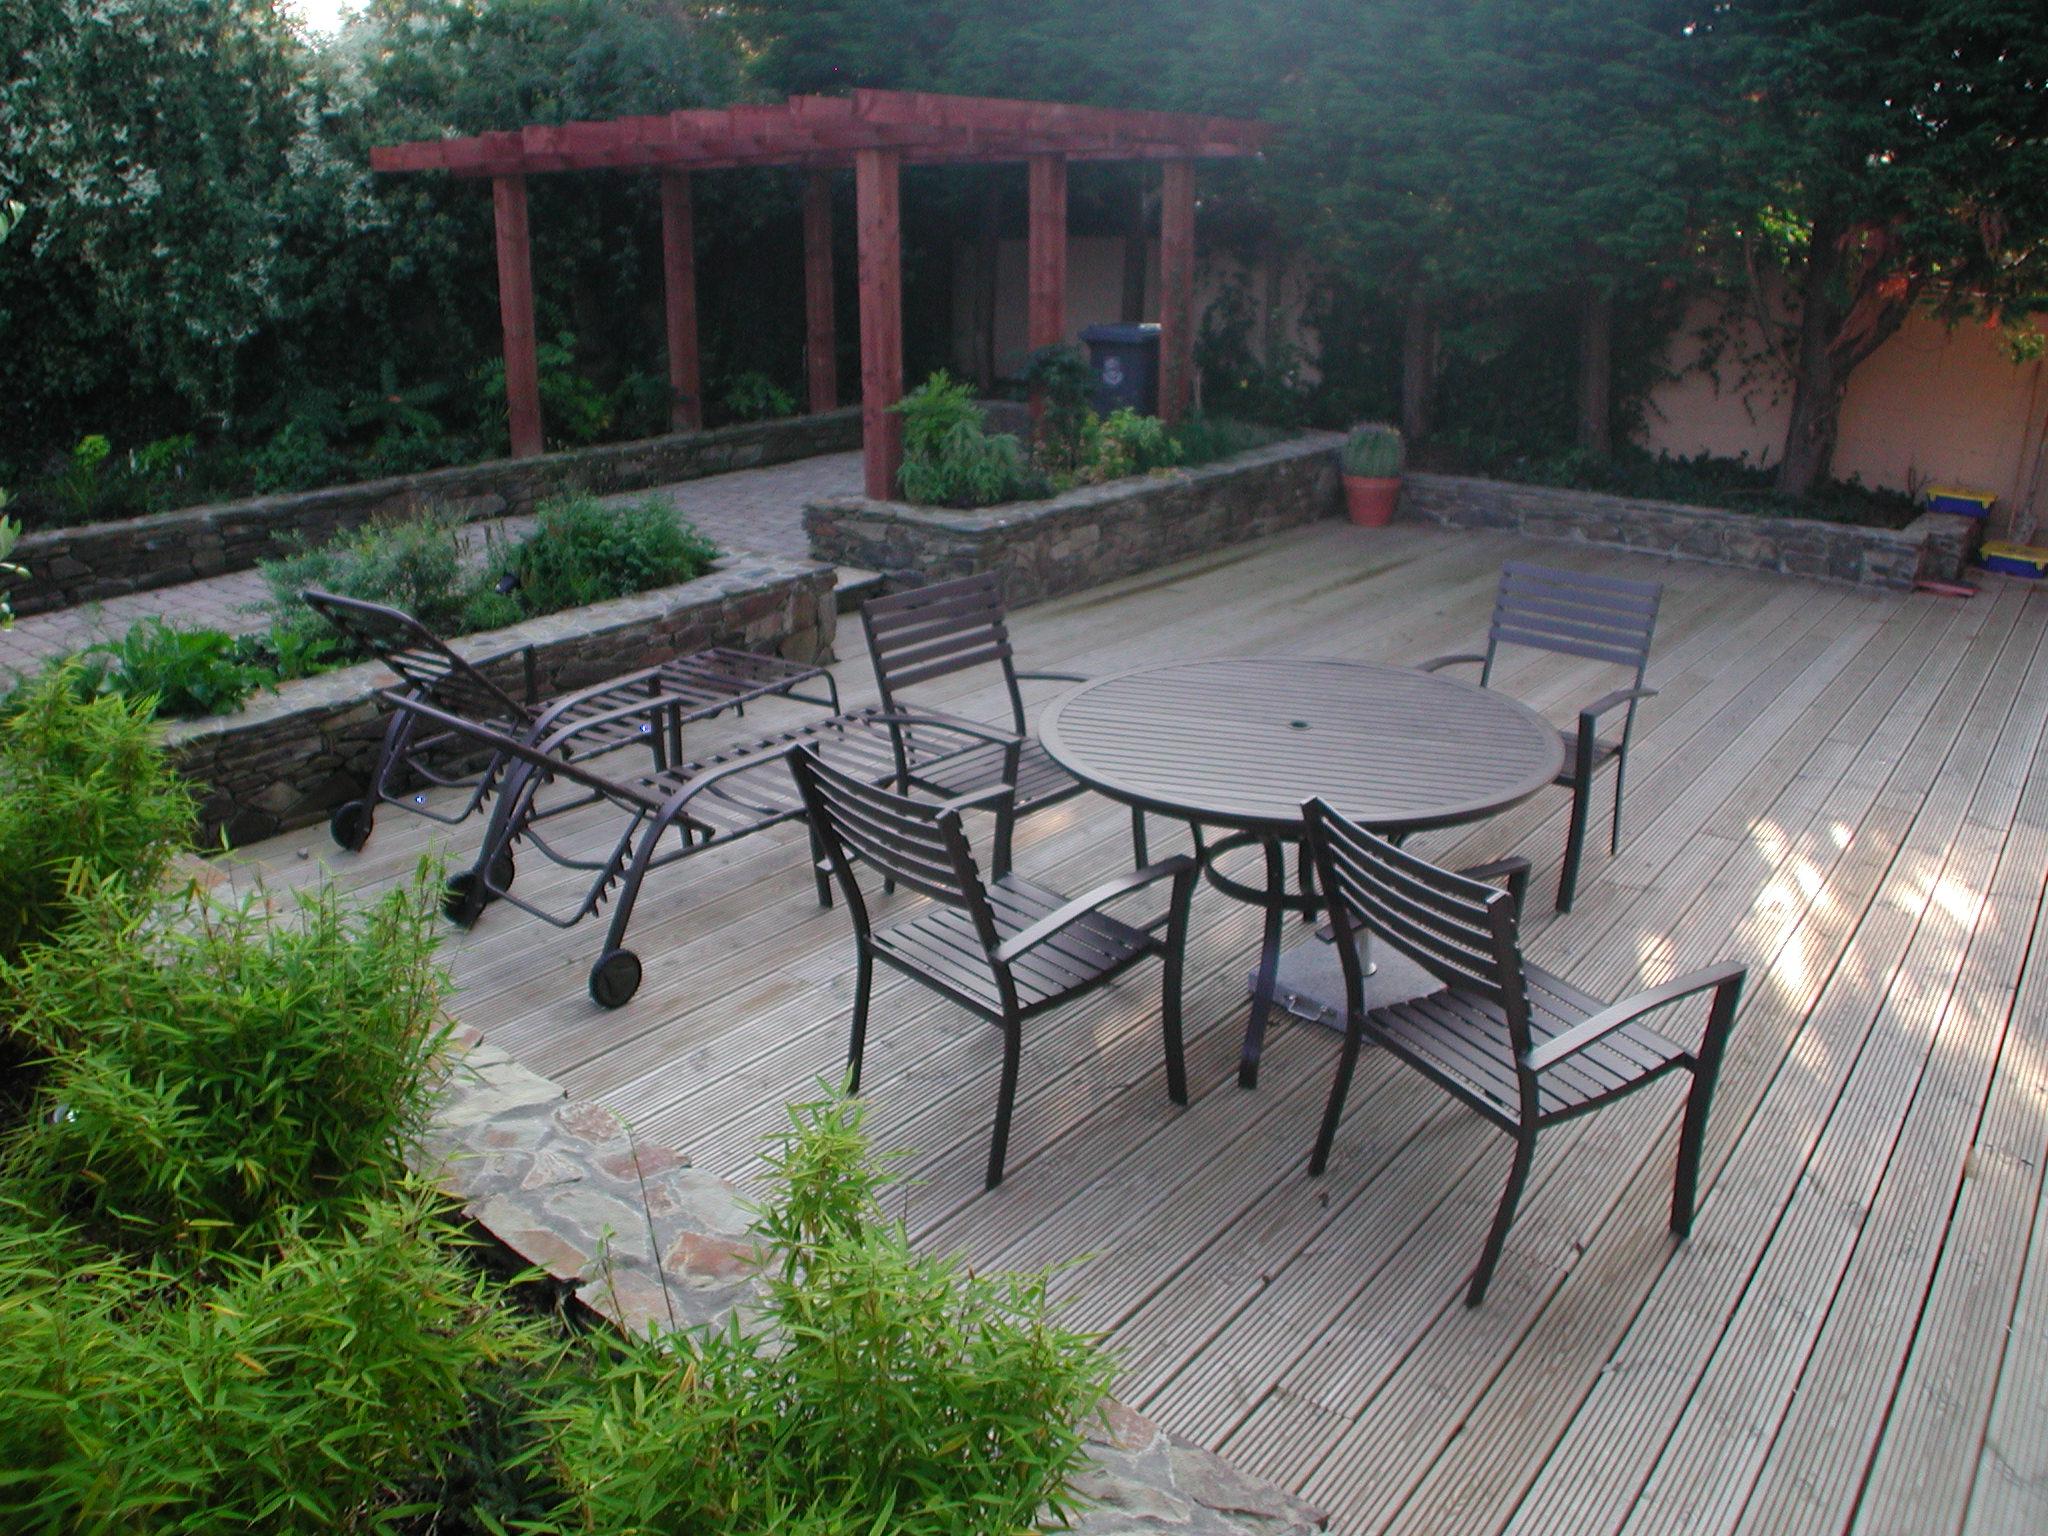 Dalkey dublin landscaping garden design driveways for Garden designs ireland